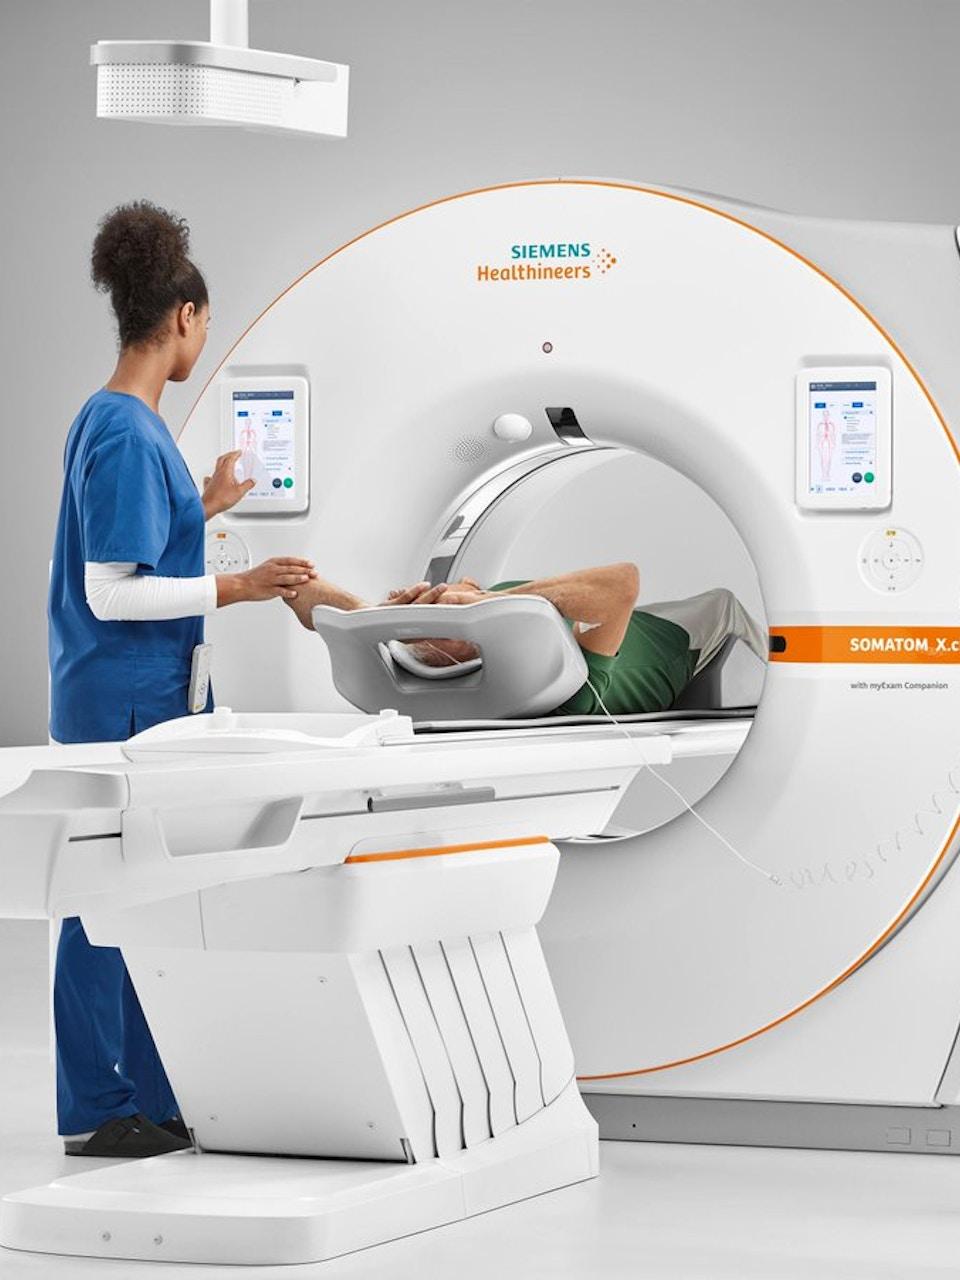 Siemens Healthineers – Somatom X